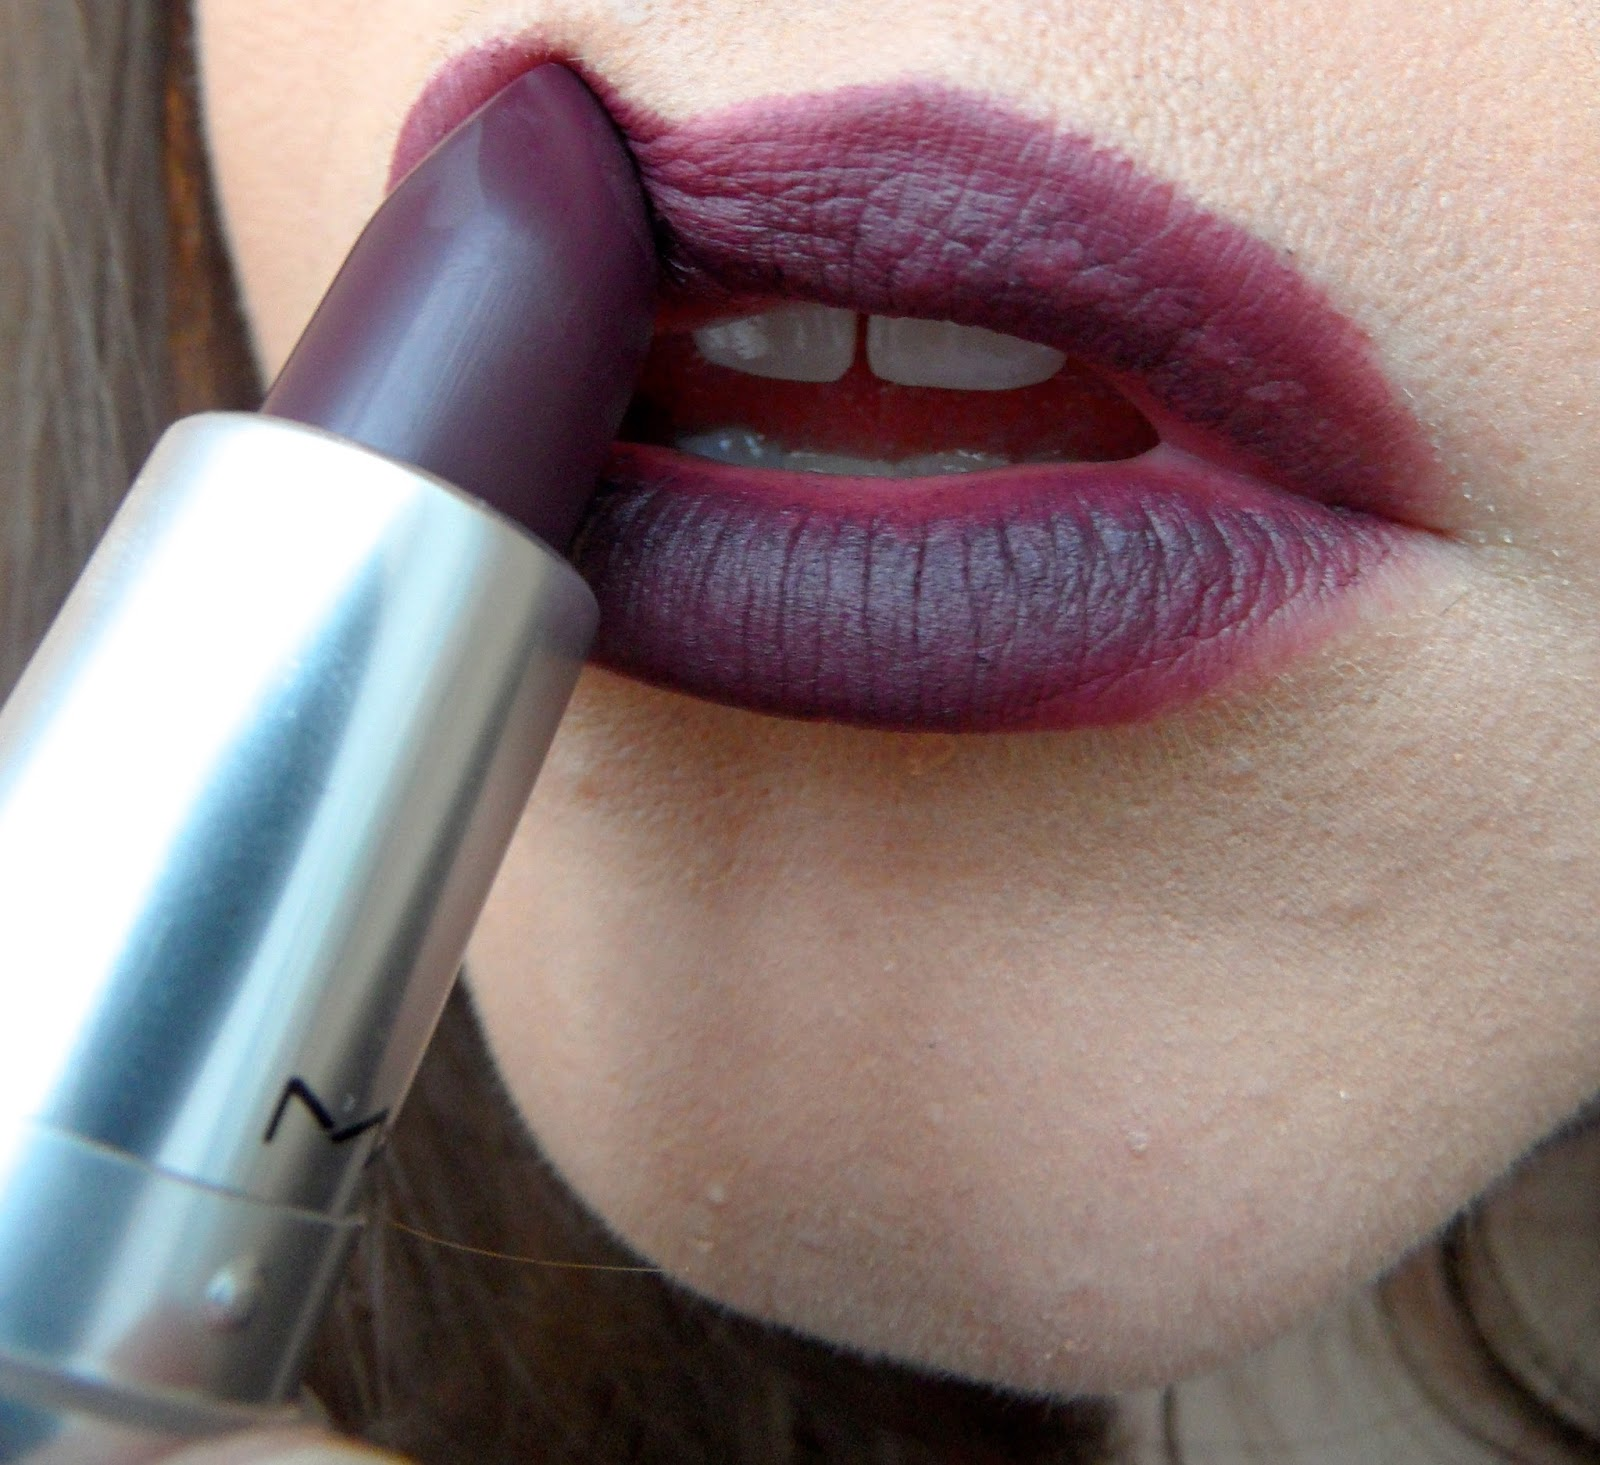 Connu Kick Arse Red Lips: Would You Wear MAC's Smoked Purple Lipstick? ZU51